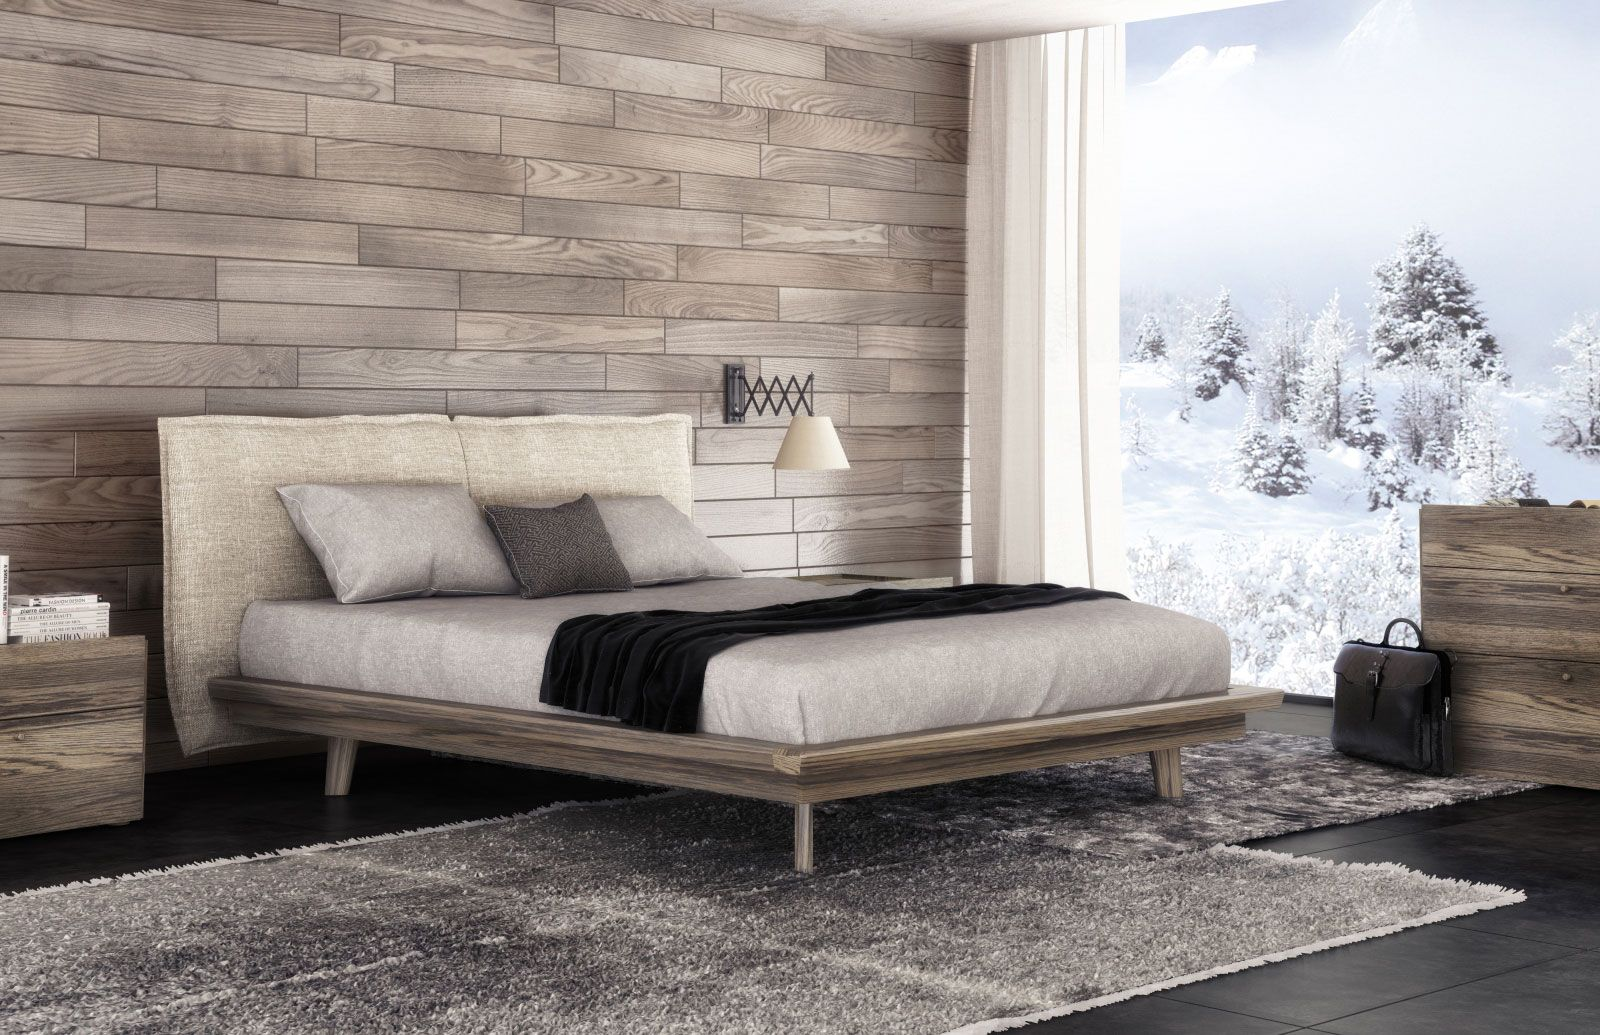 Motion Collection Bedroom design, New york bedroom